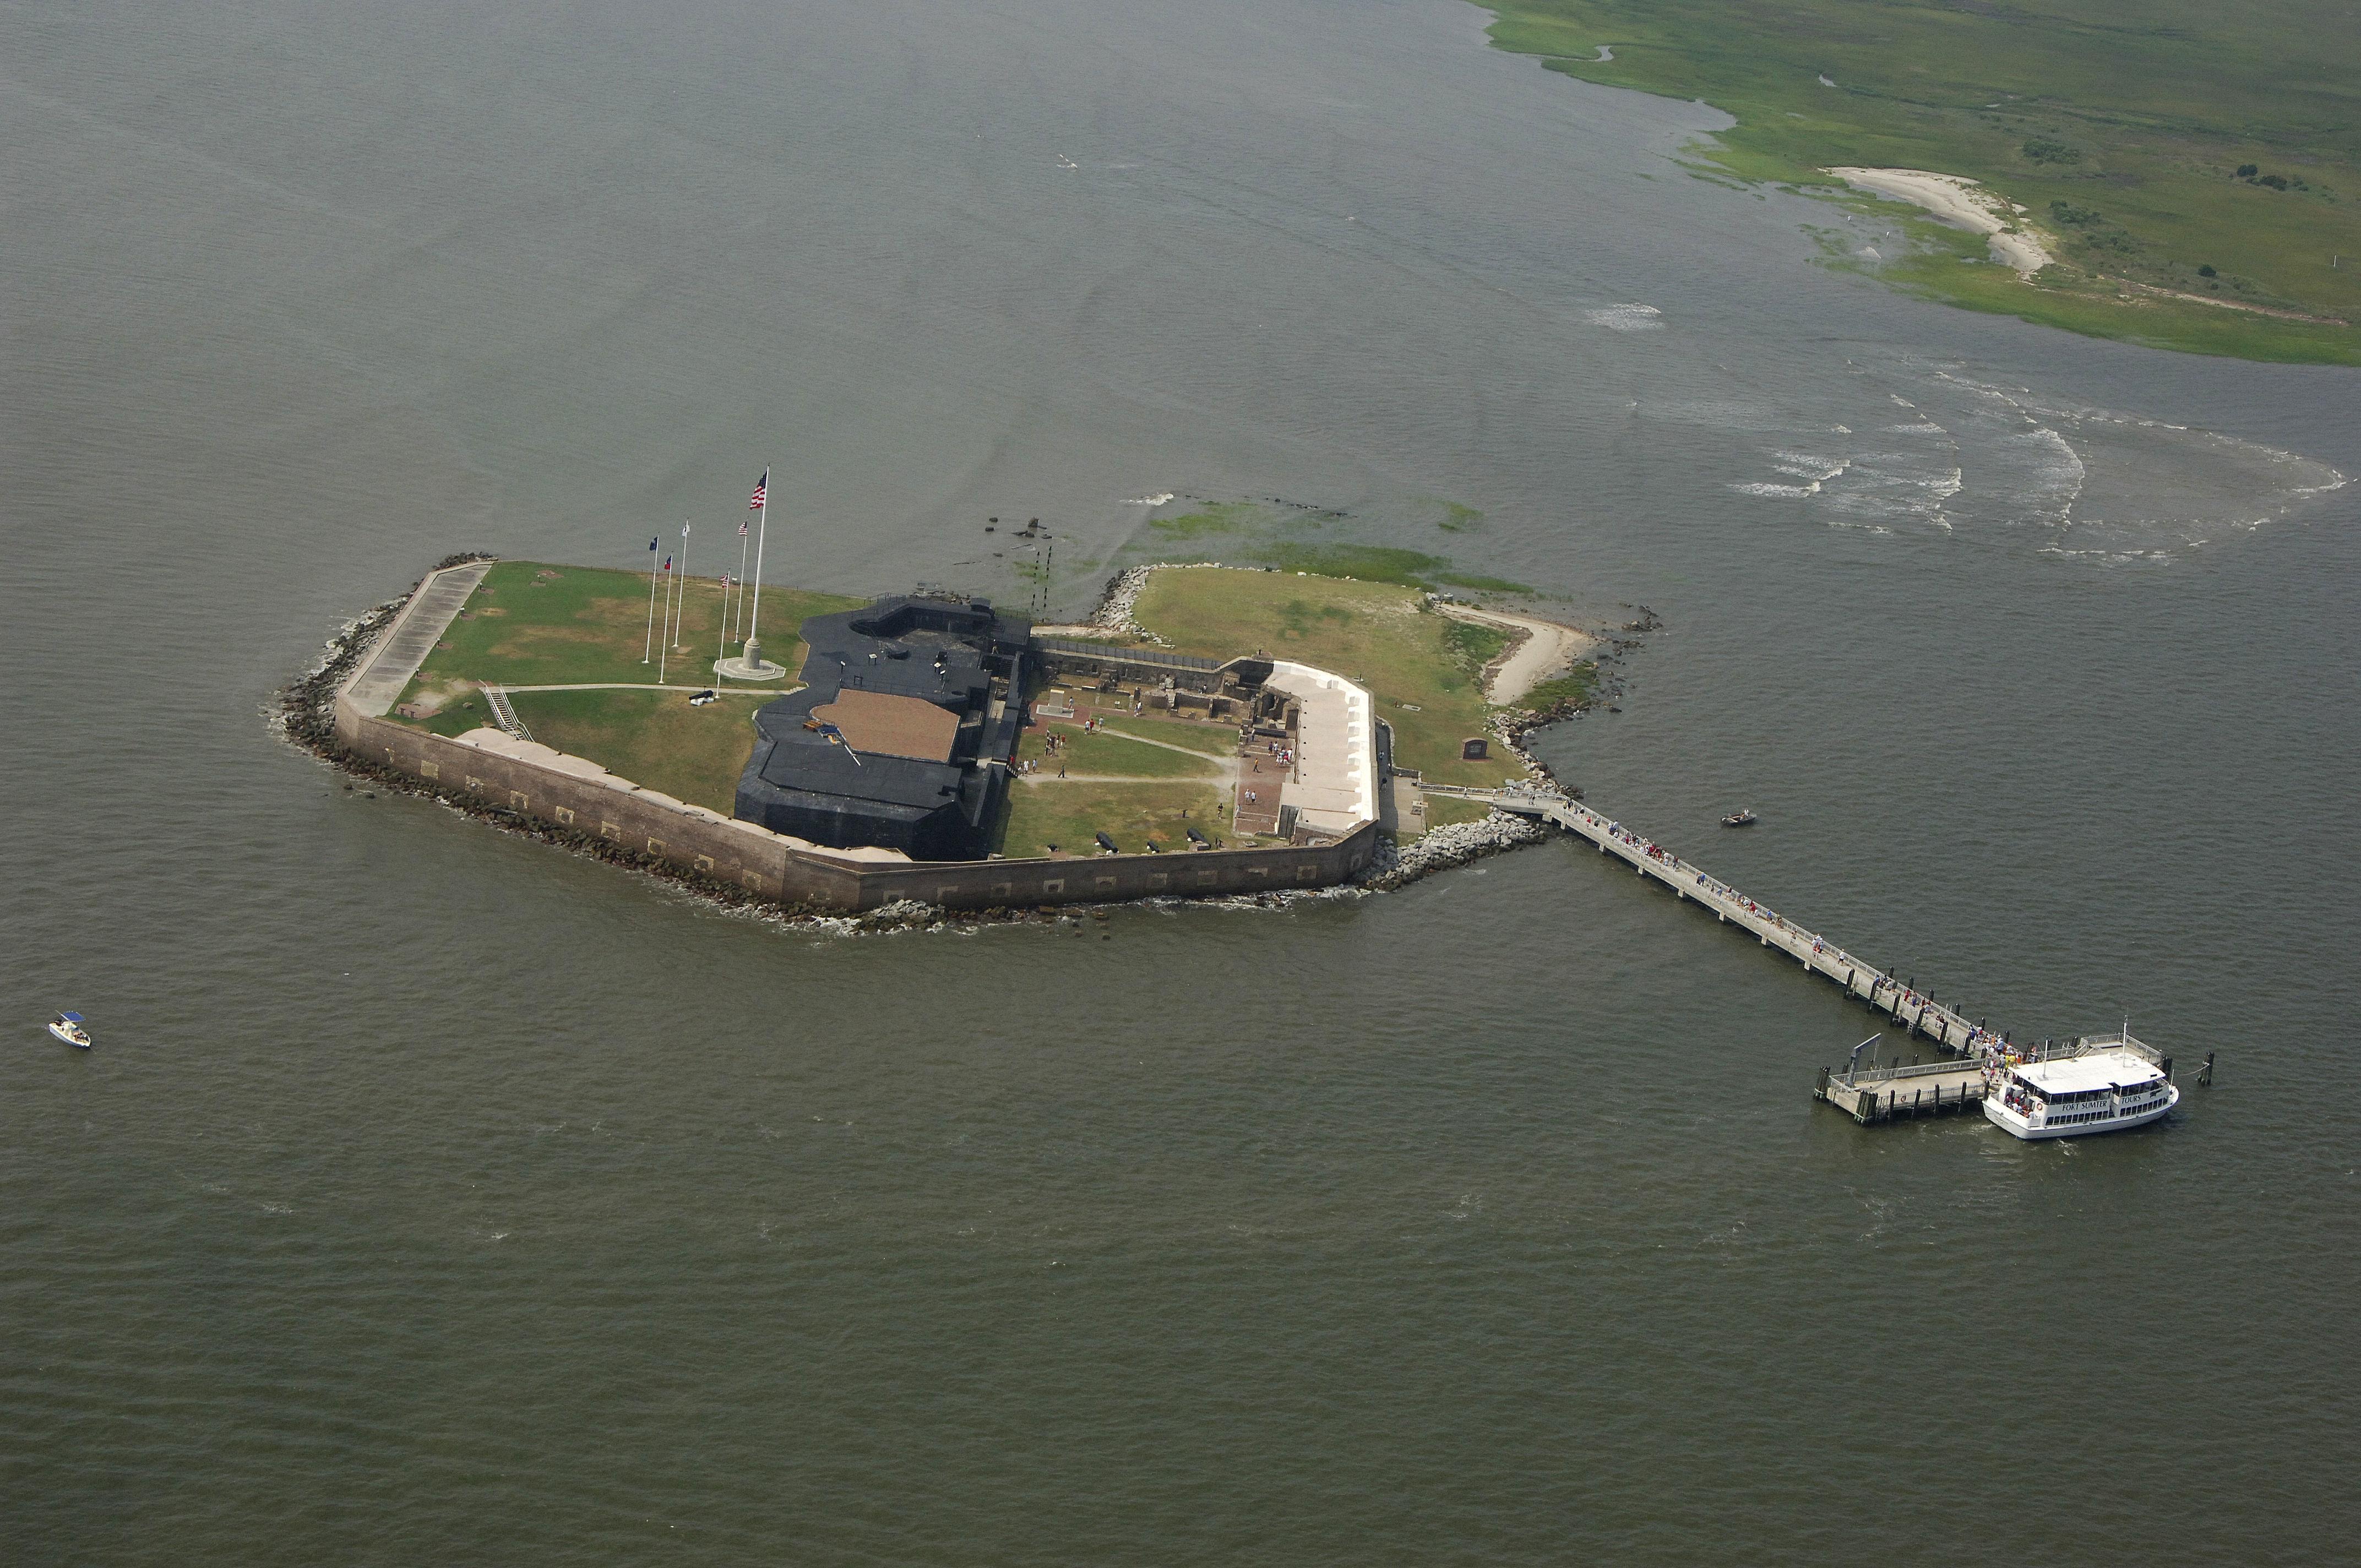 Charleston Sc To Myrtle Beach >> Fort Sumter Landmark in Sullivan's Island, SC, United ...